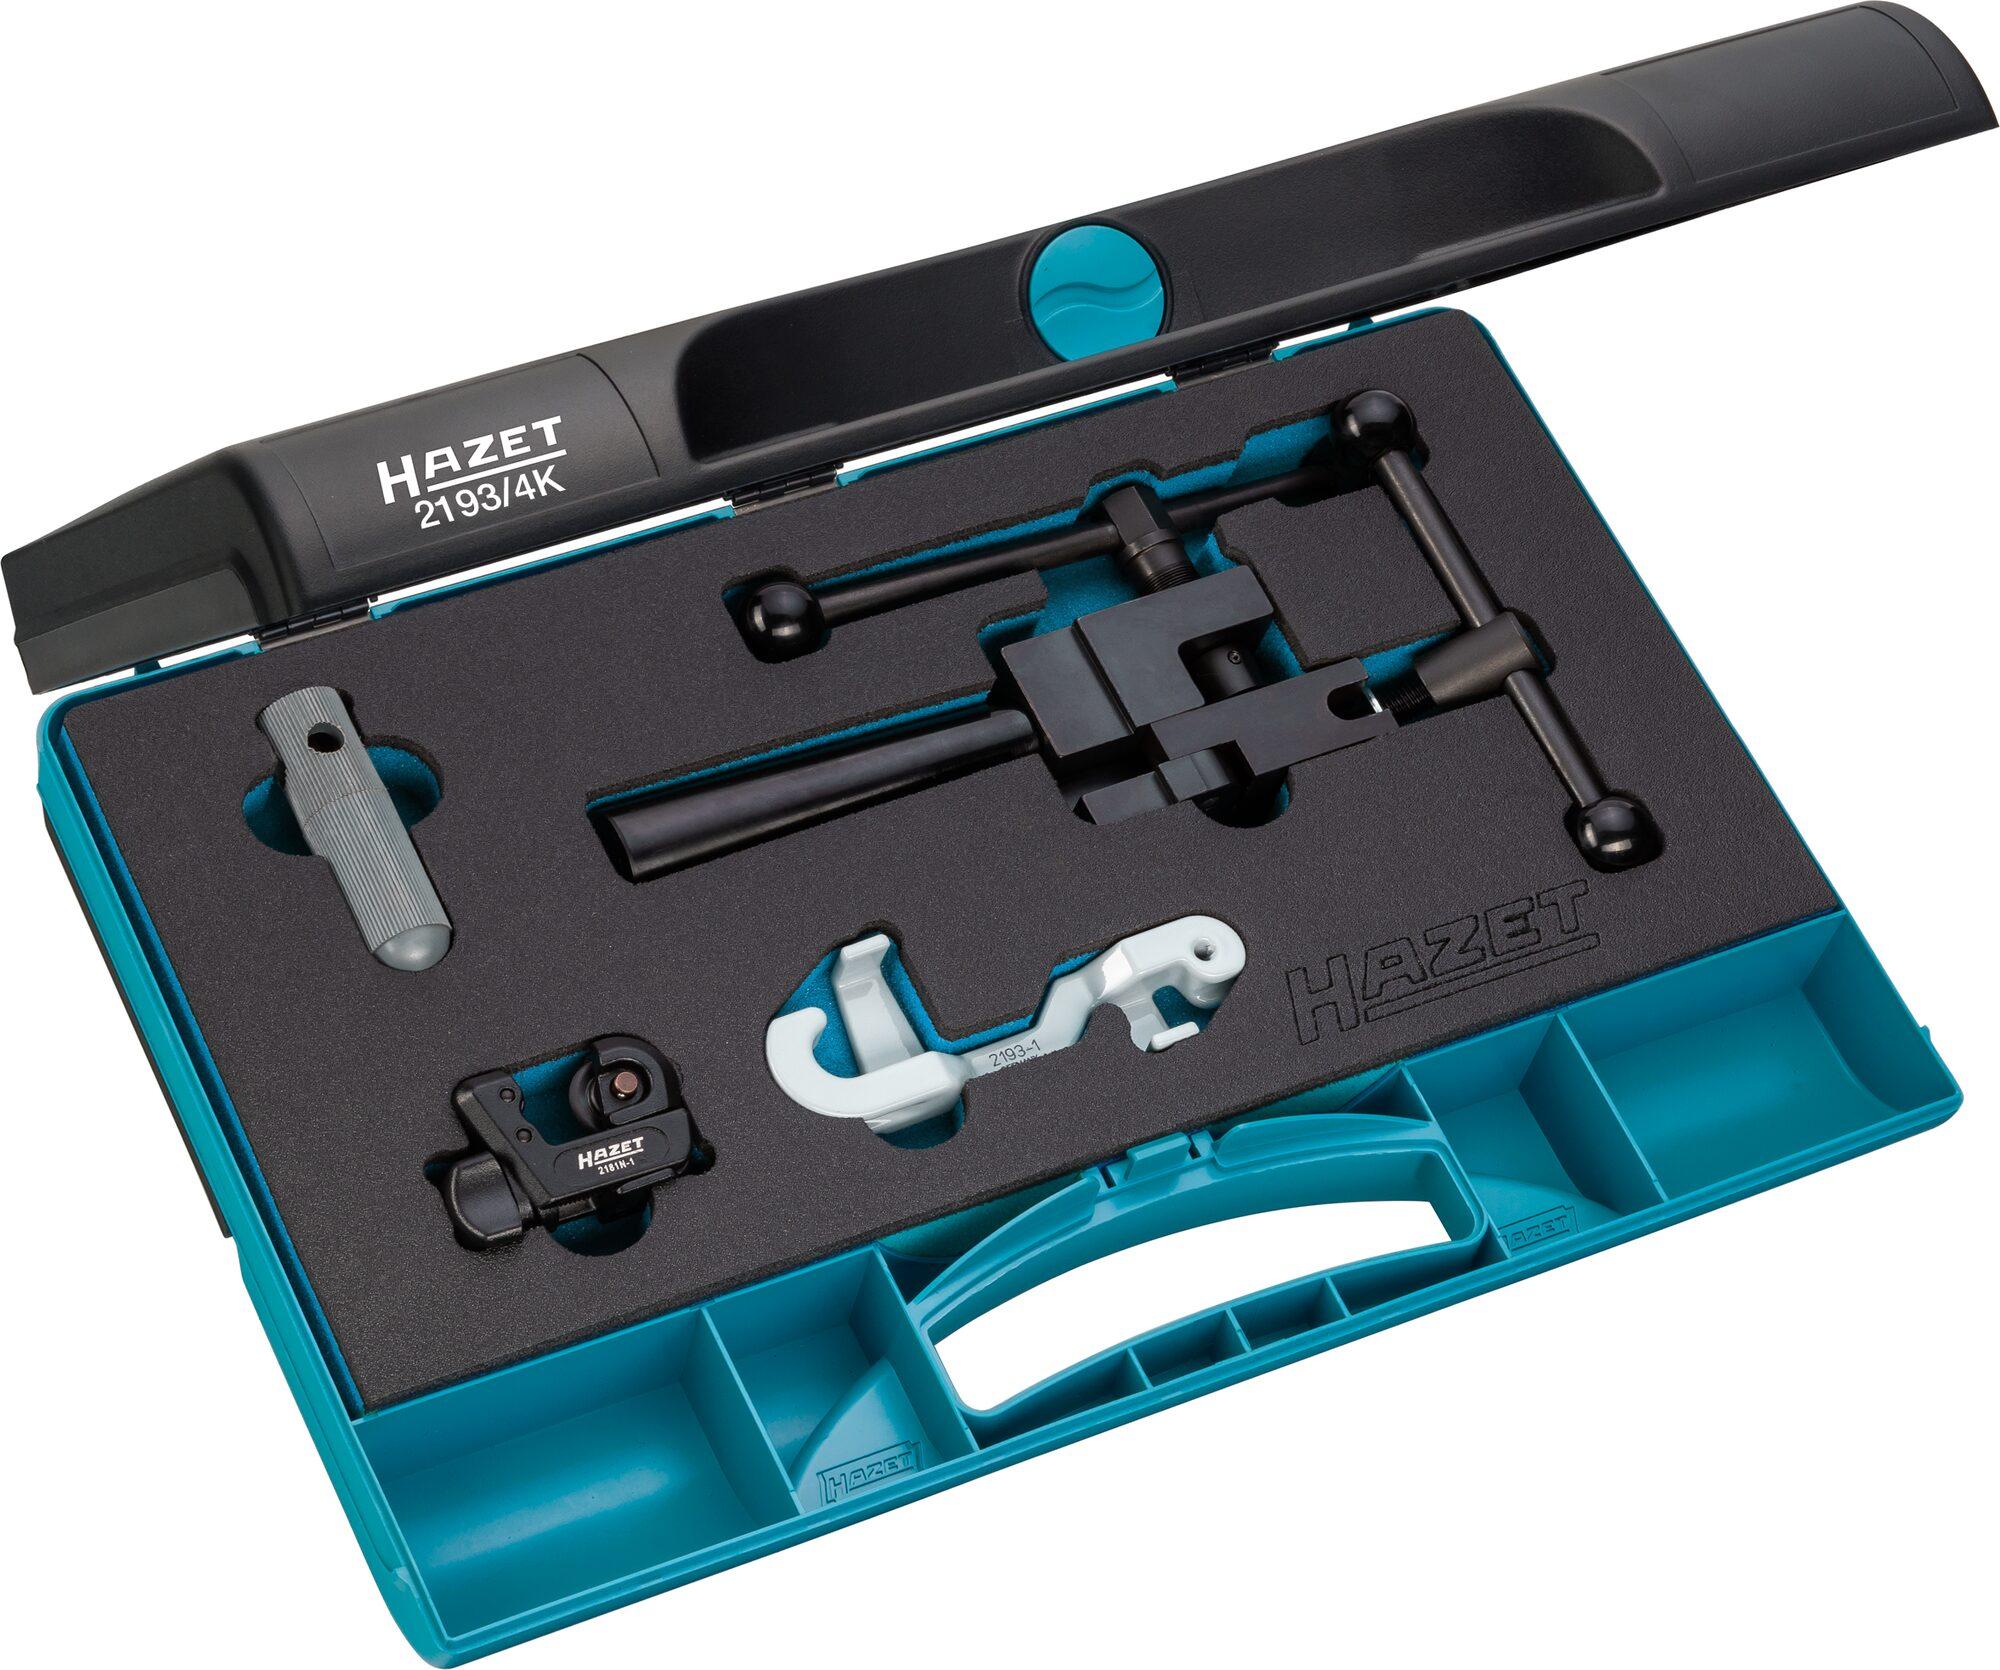 HAZET Bördelgerät Satz 2193/4K ∙ Anzahl Werkzeuge: 4